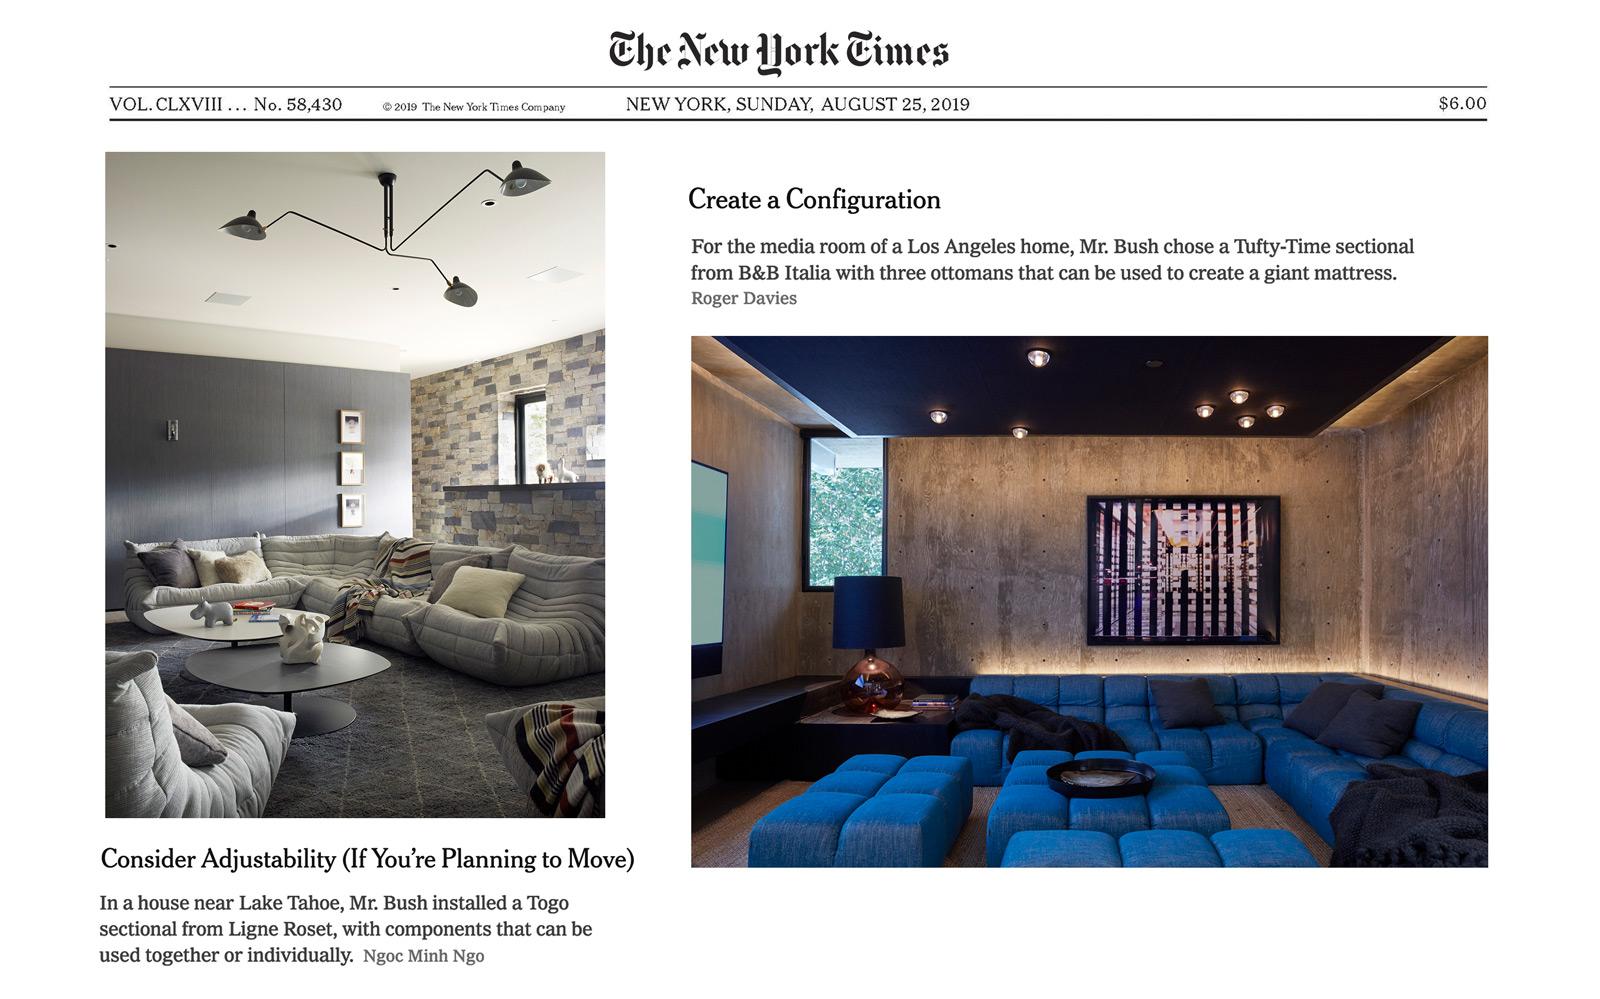 NYTImes-article-choosing-a-sectional-sofa-p2.jpg